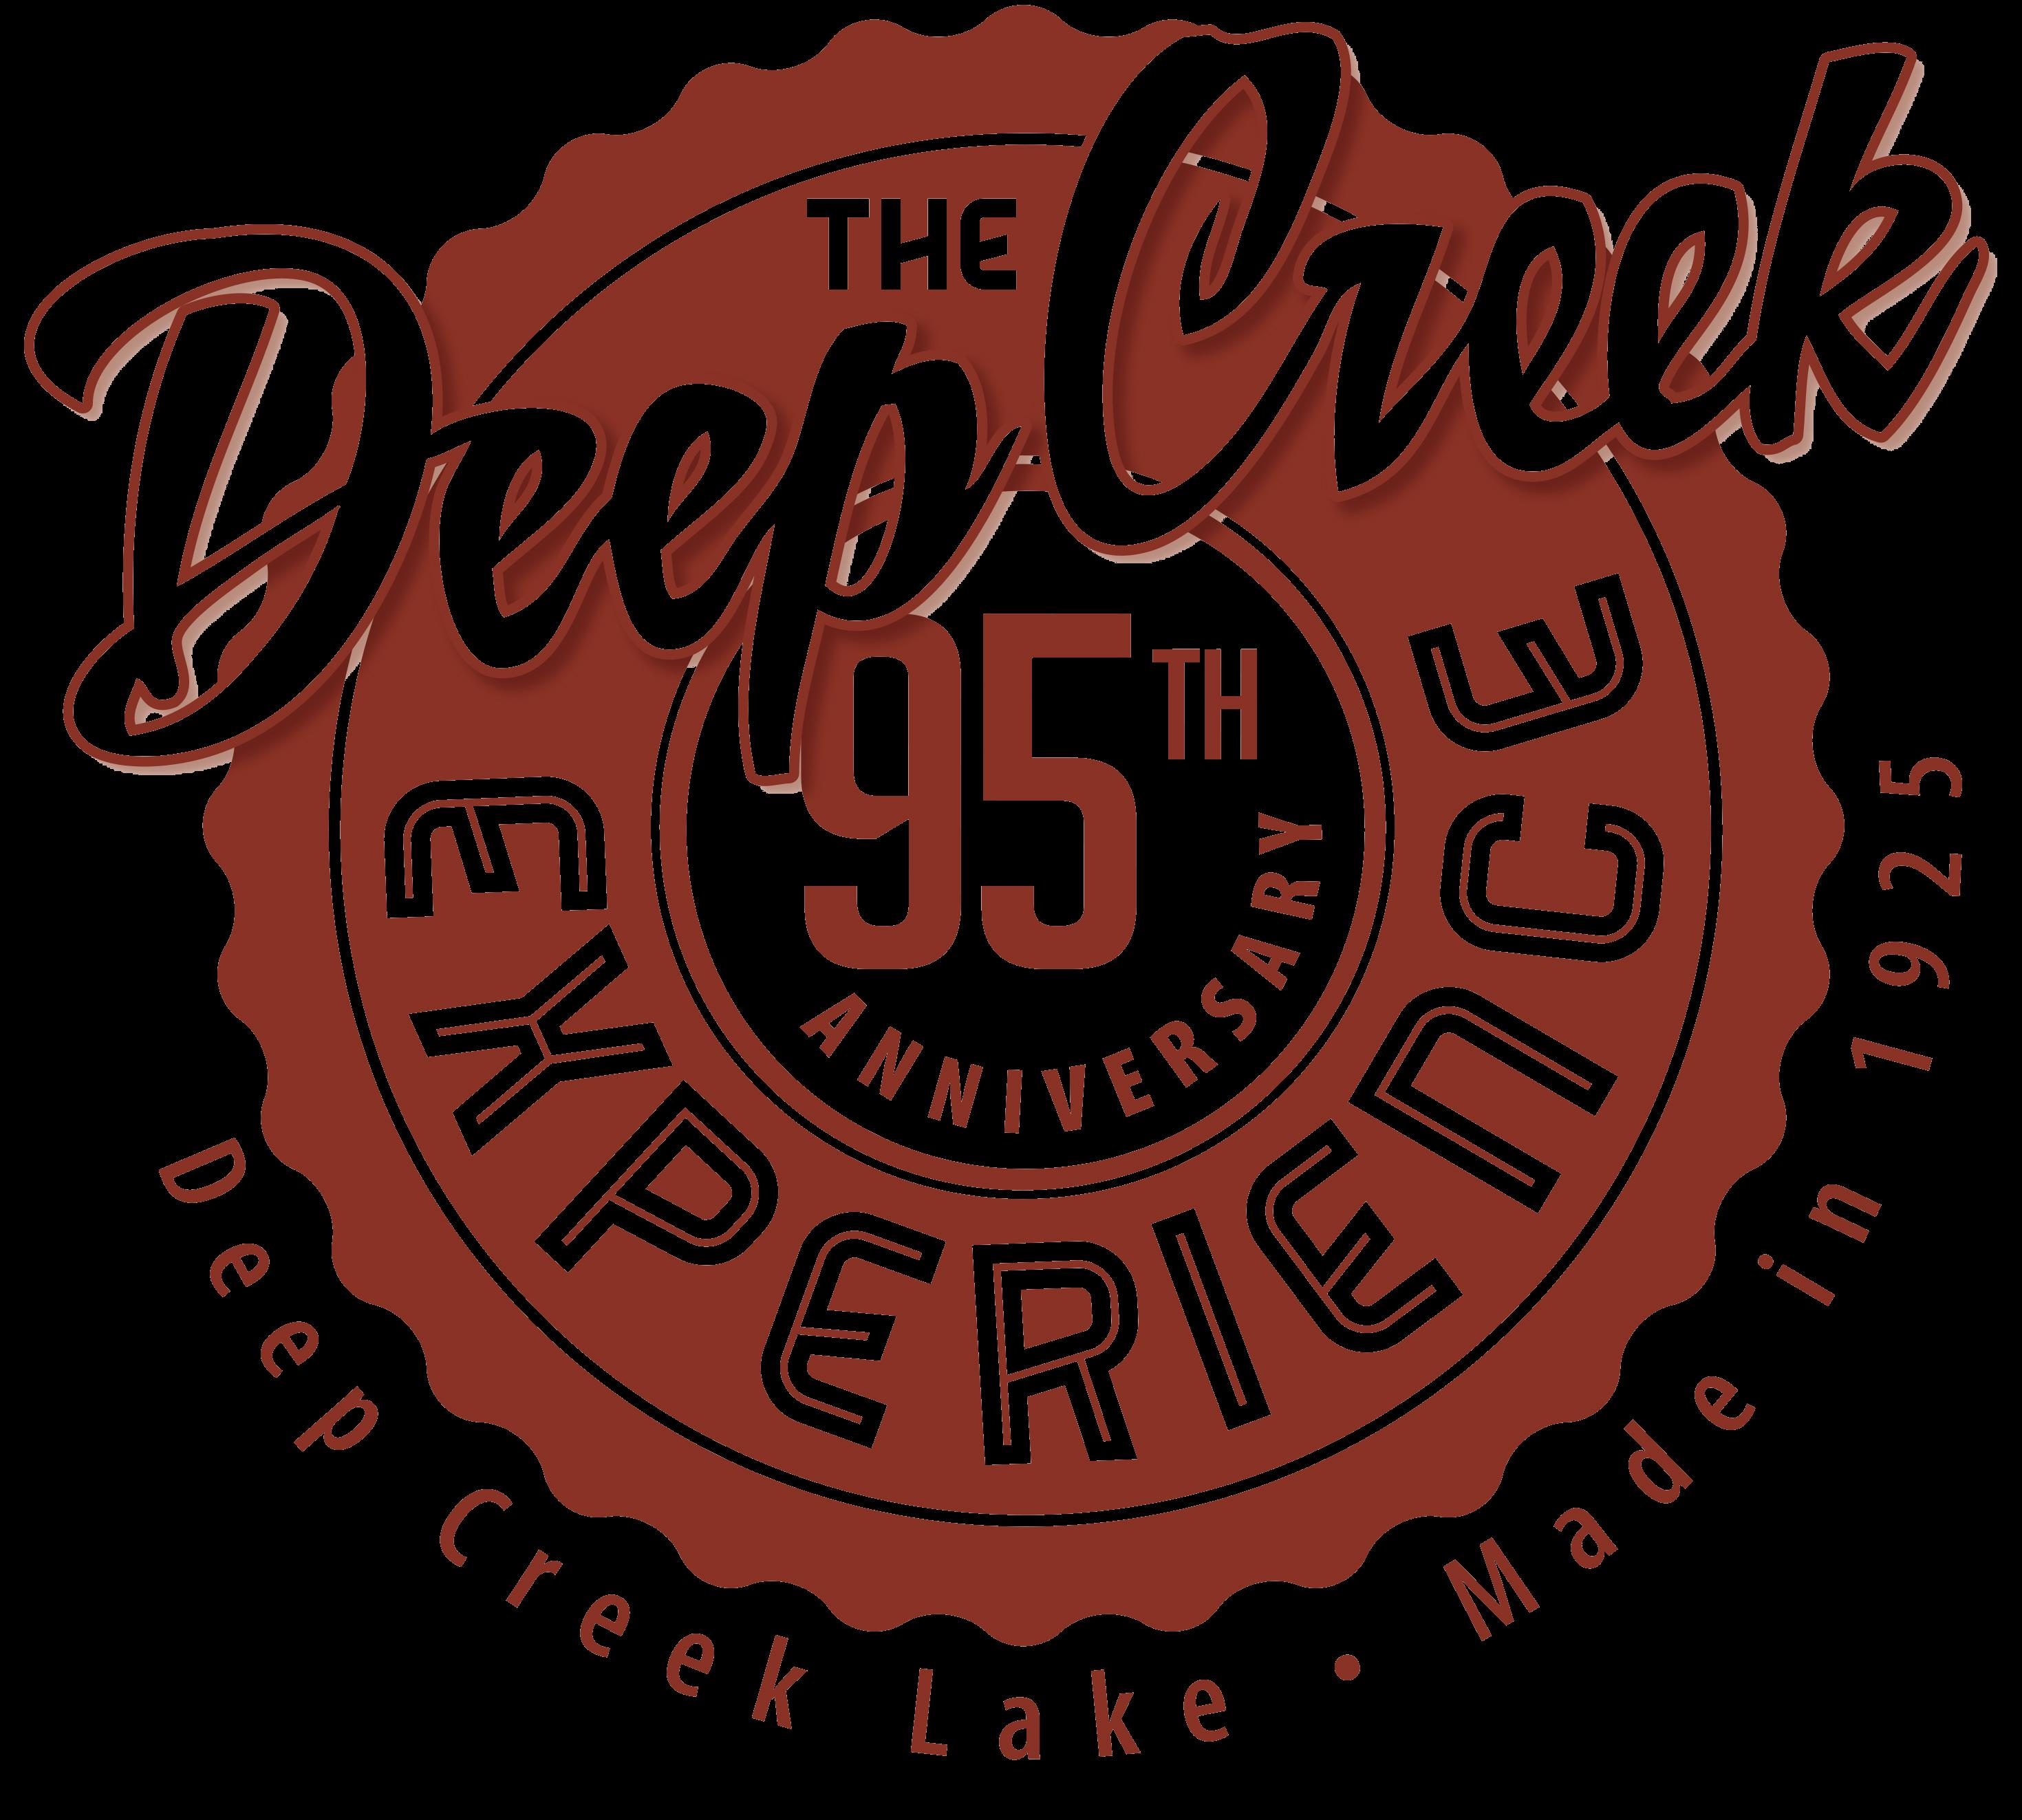 95th Anniversary of Deep Creek Lake